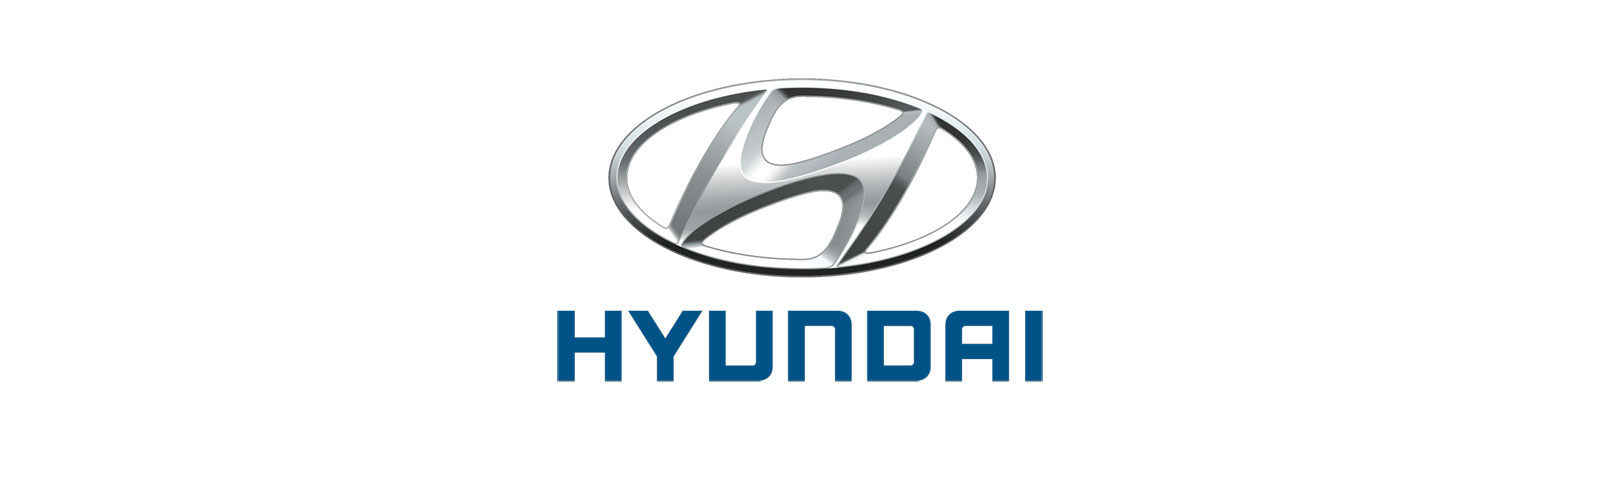 Hyundai appoints a former BMW designer as head of its Hyundai Design Innovation Group